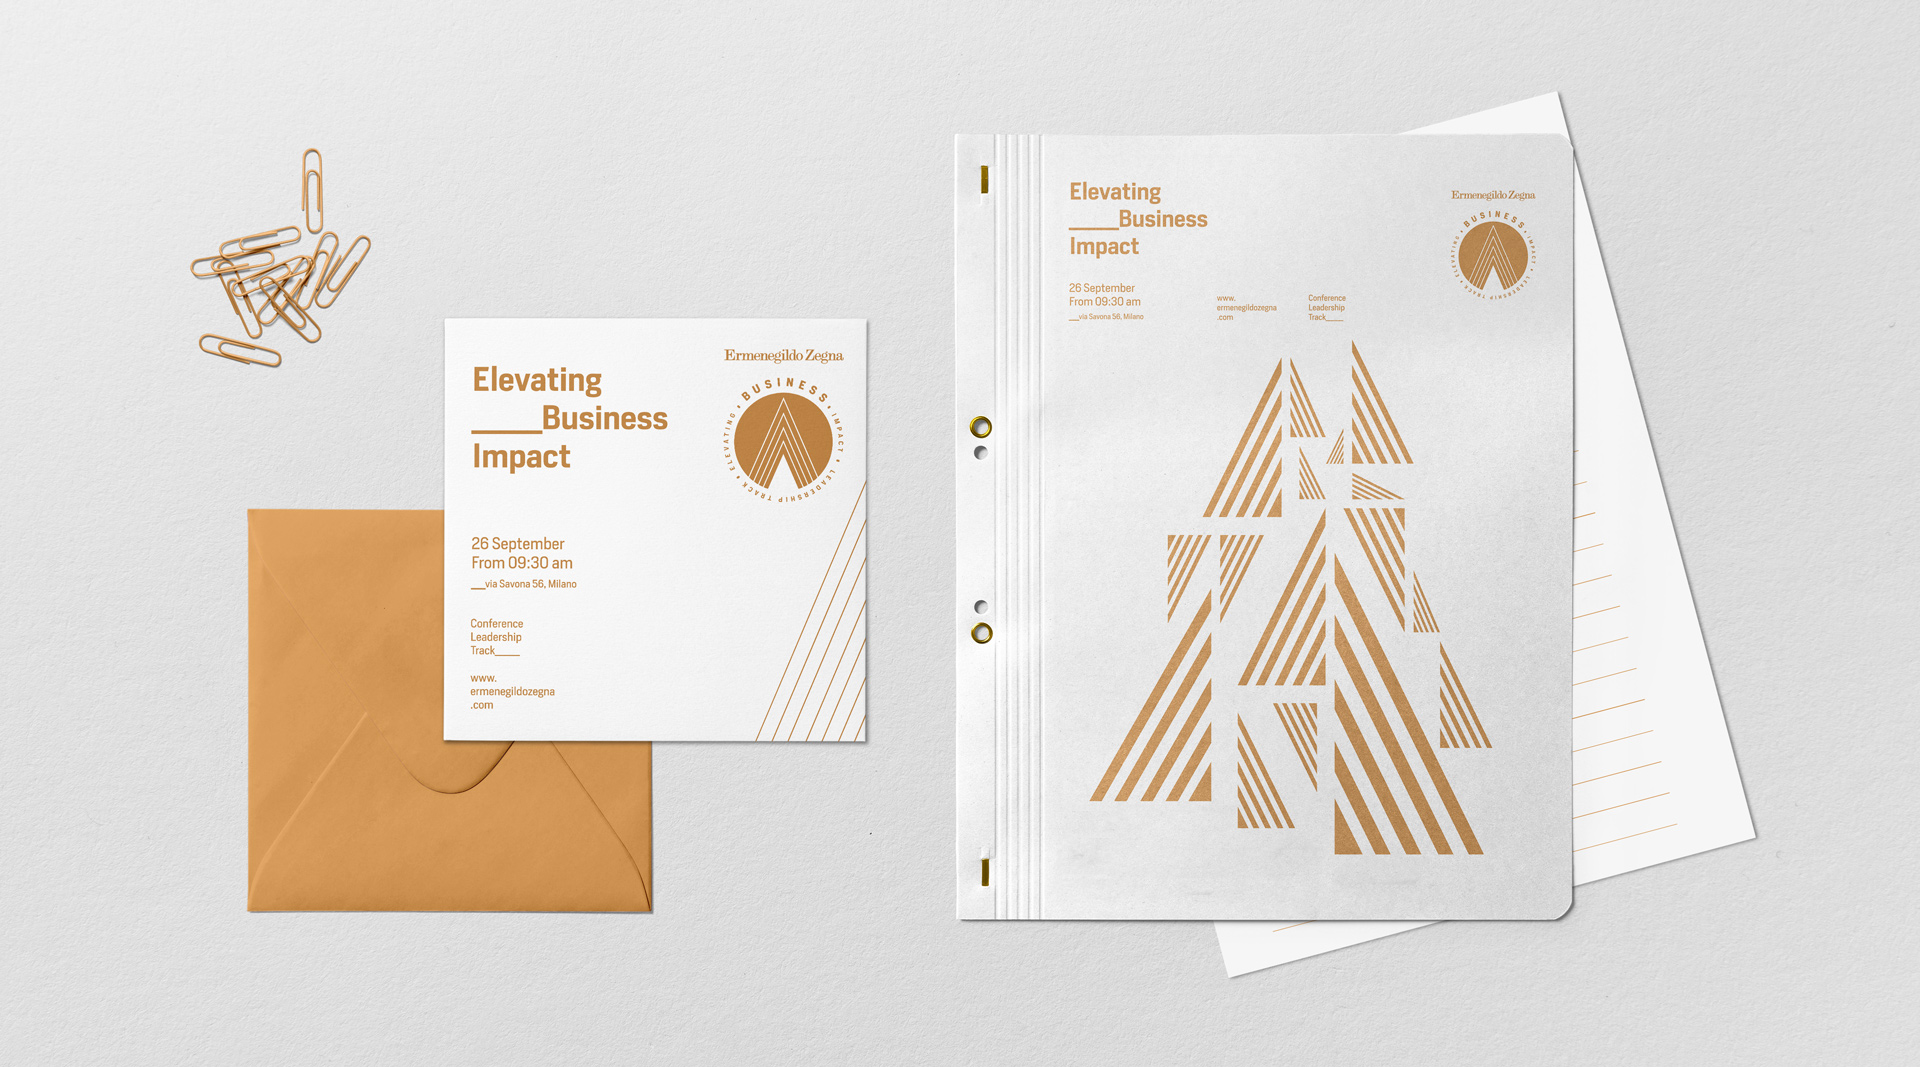 Ermenegildo Zegna visual leadership business event visual design graphic design fashion visual